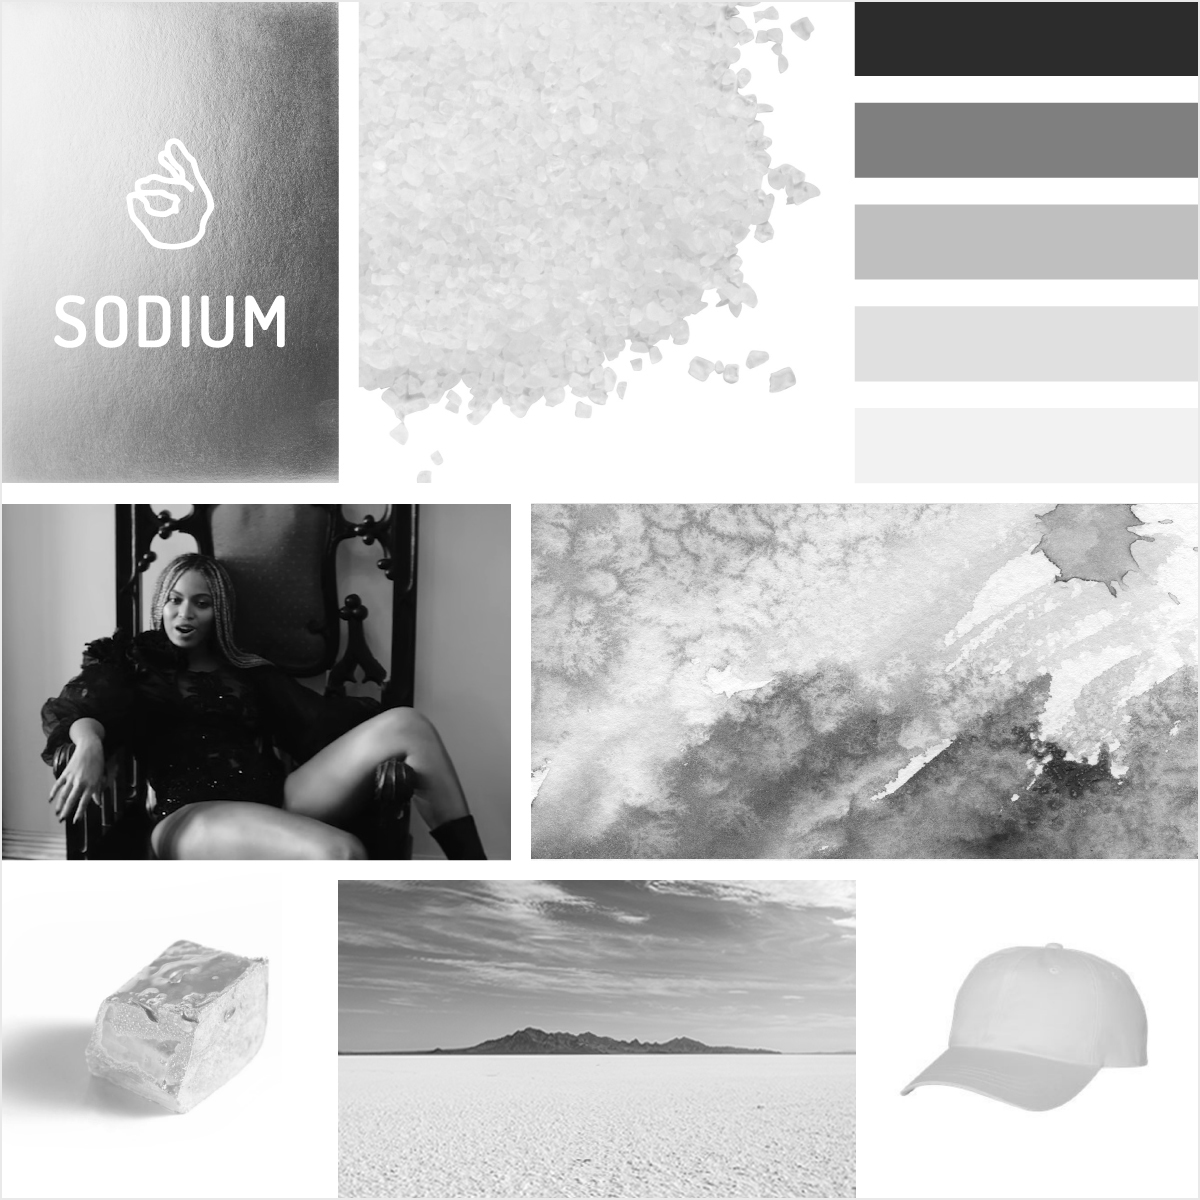 Sodium_Moodboard_v7wborder.jpg